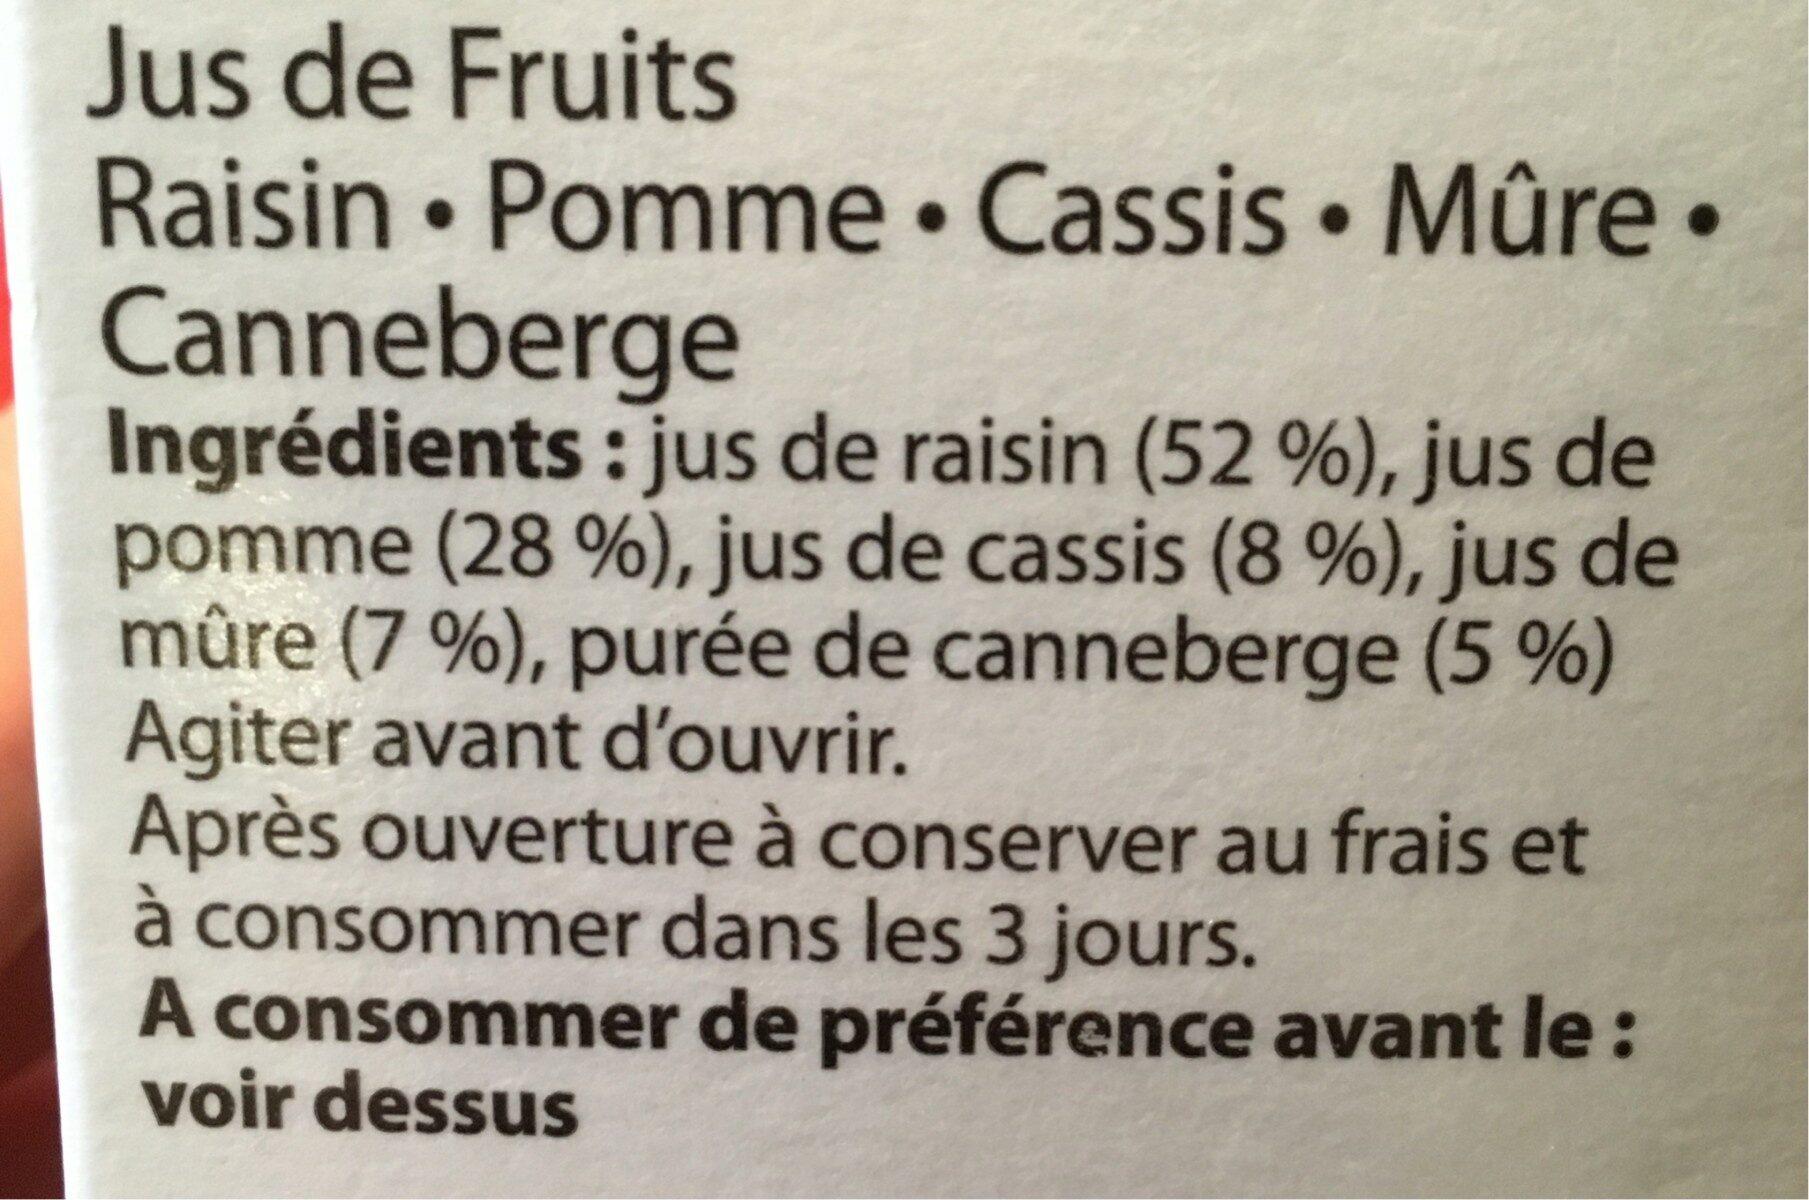 Ananas, orange sanguine, fruit de la passion, mangue banane - Ingredients